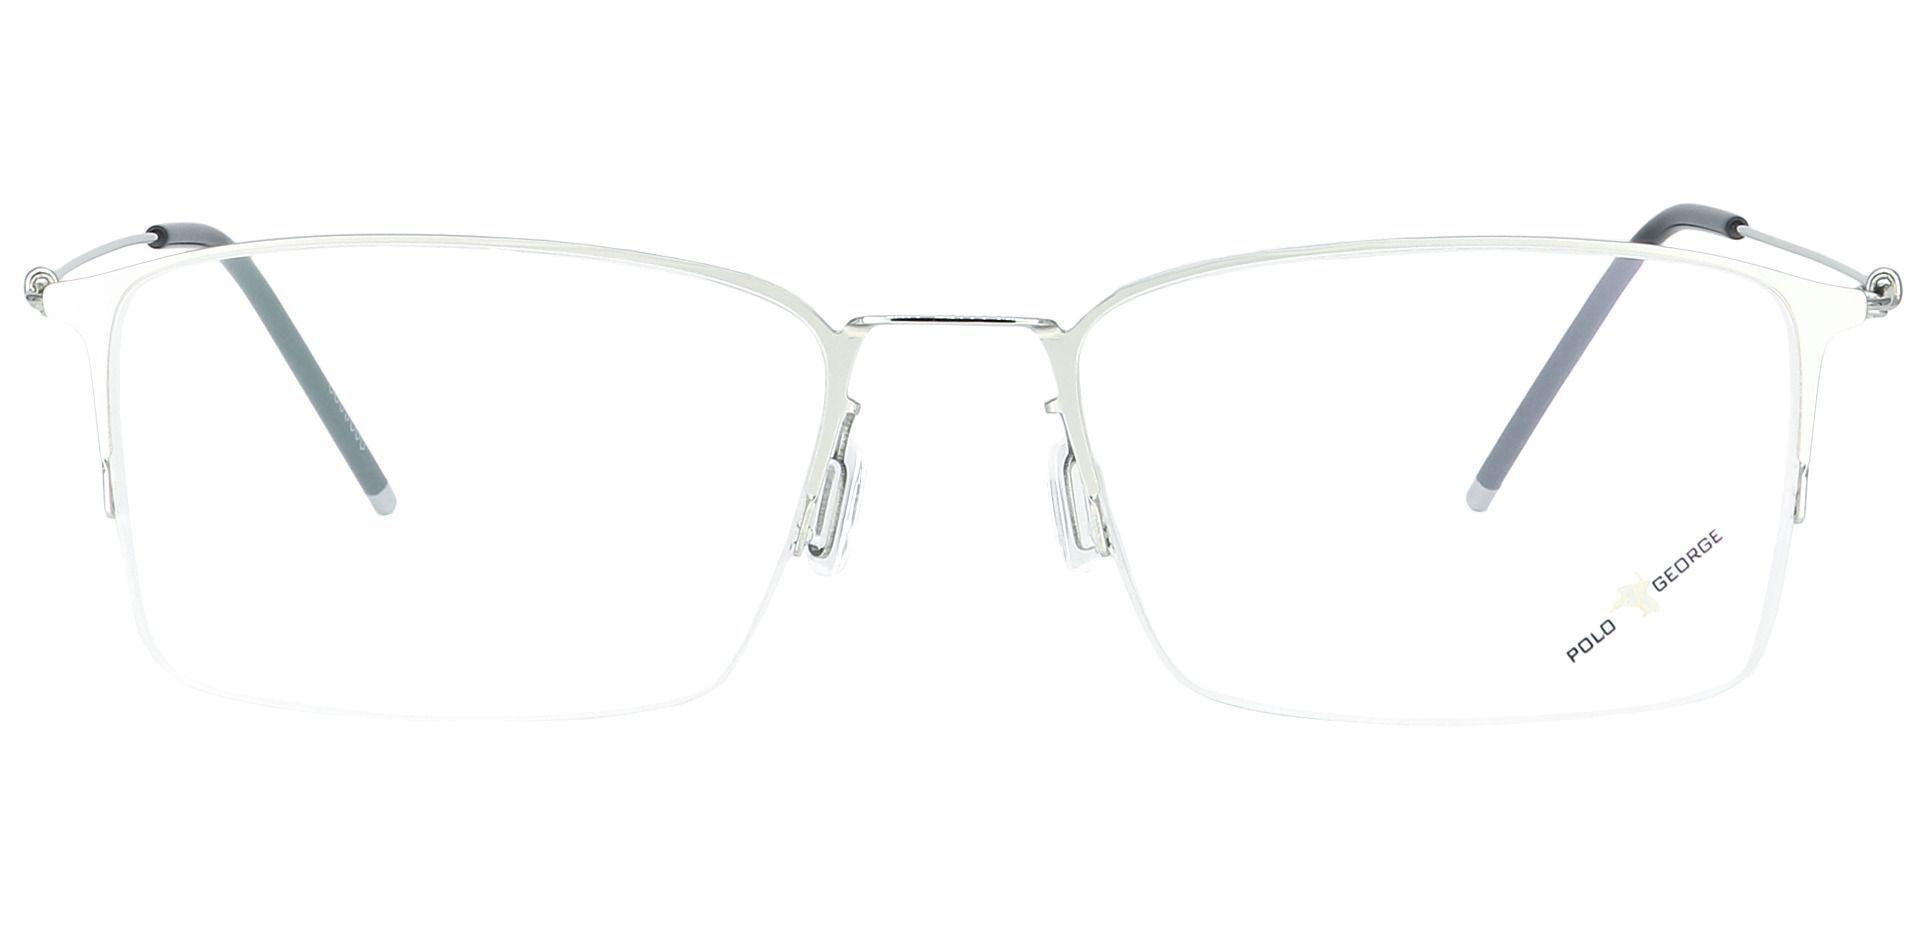 Shaw Square Blue Light Blocking Glasses - Clear